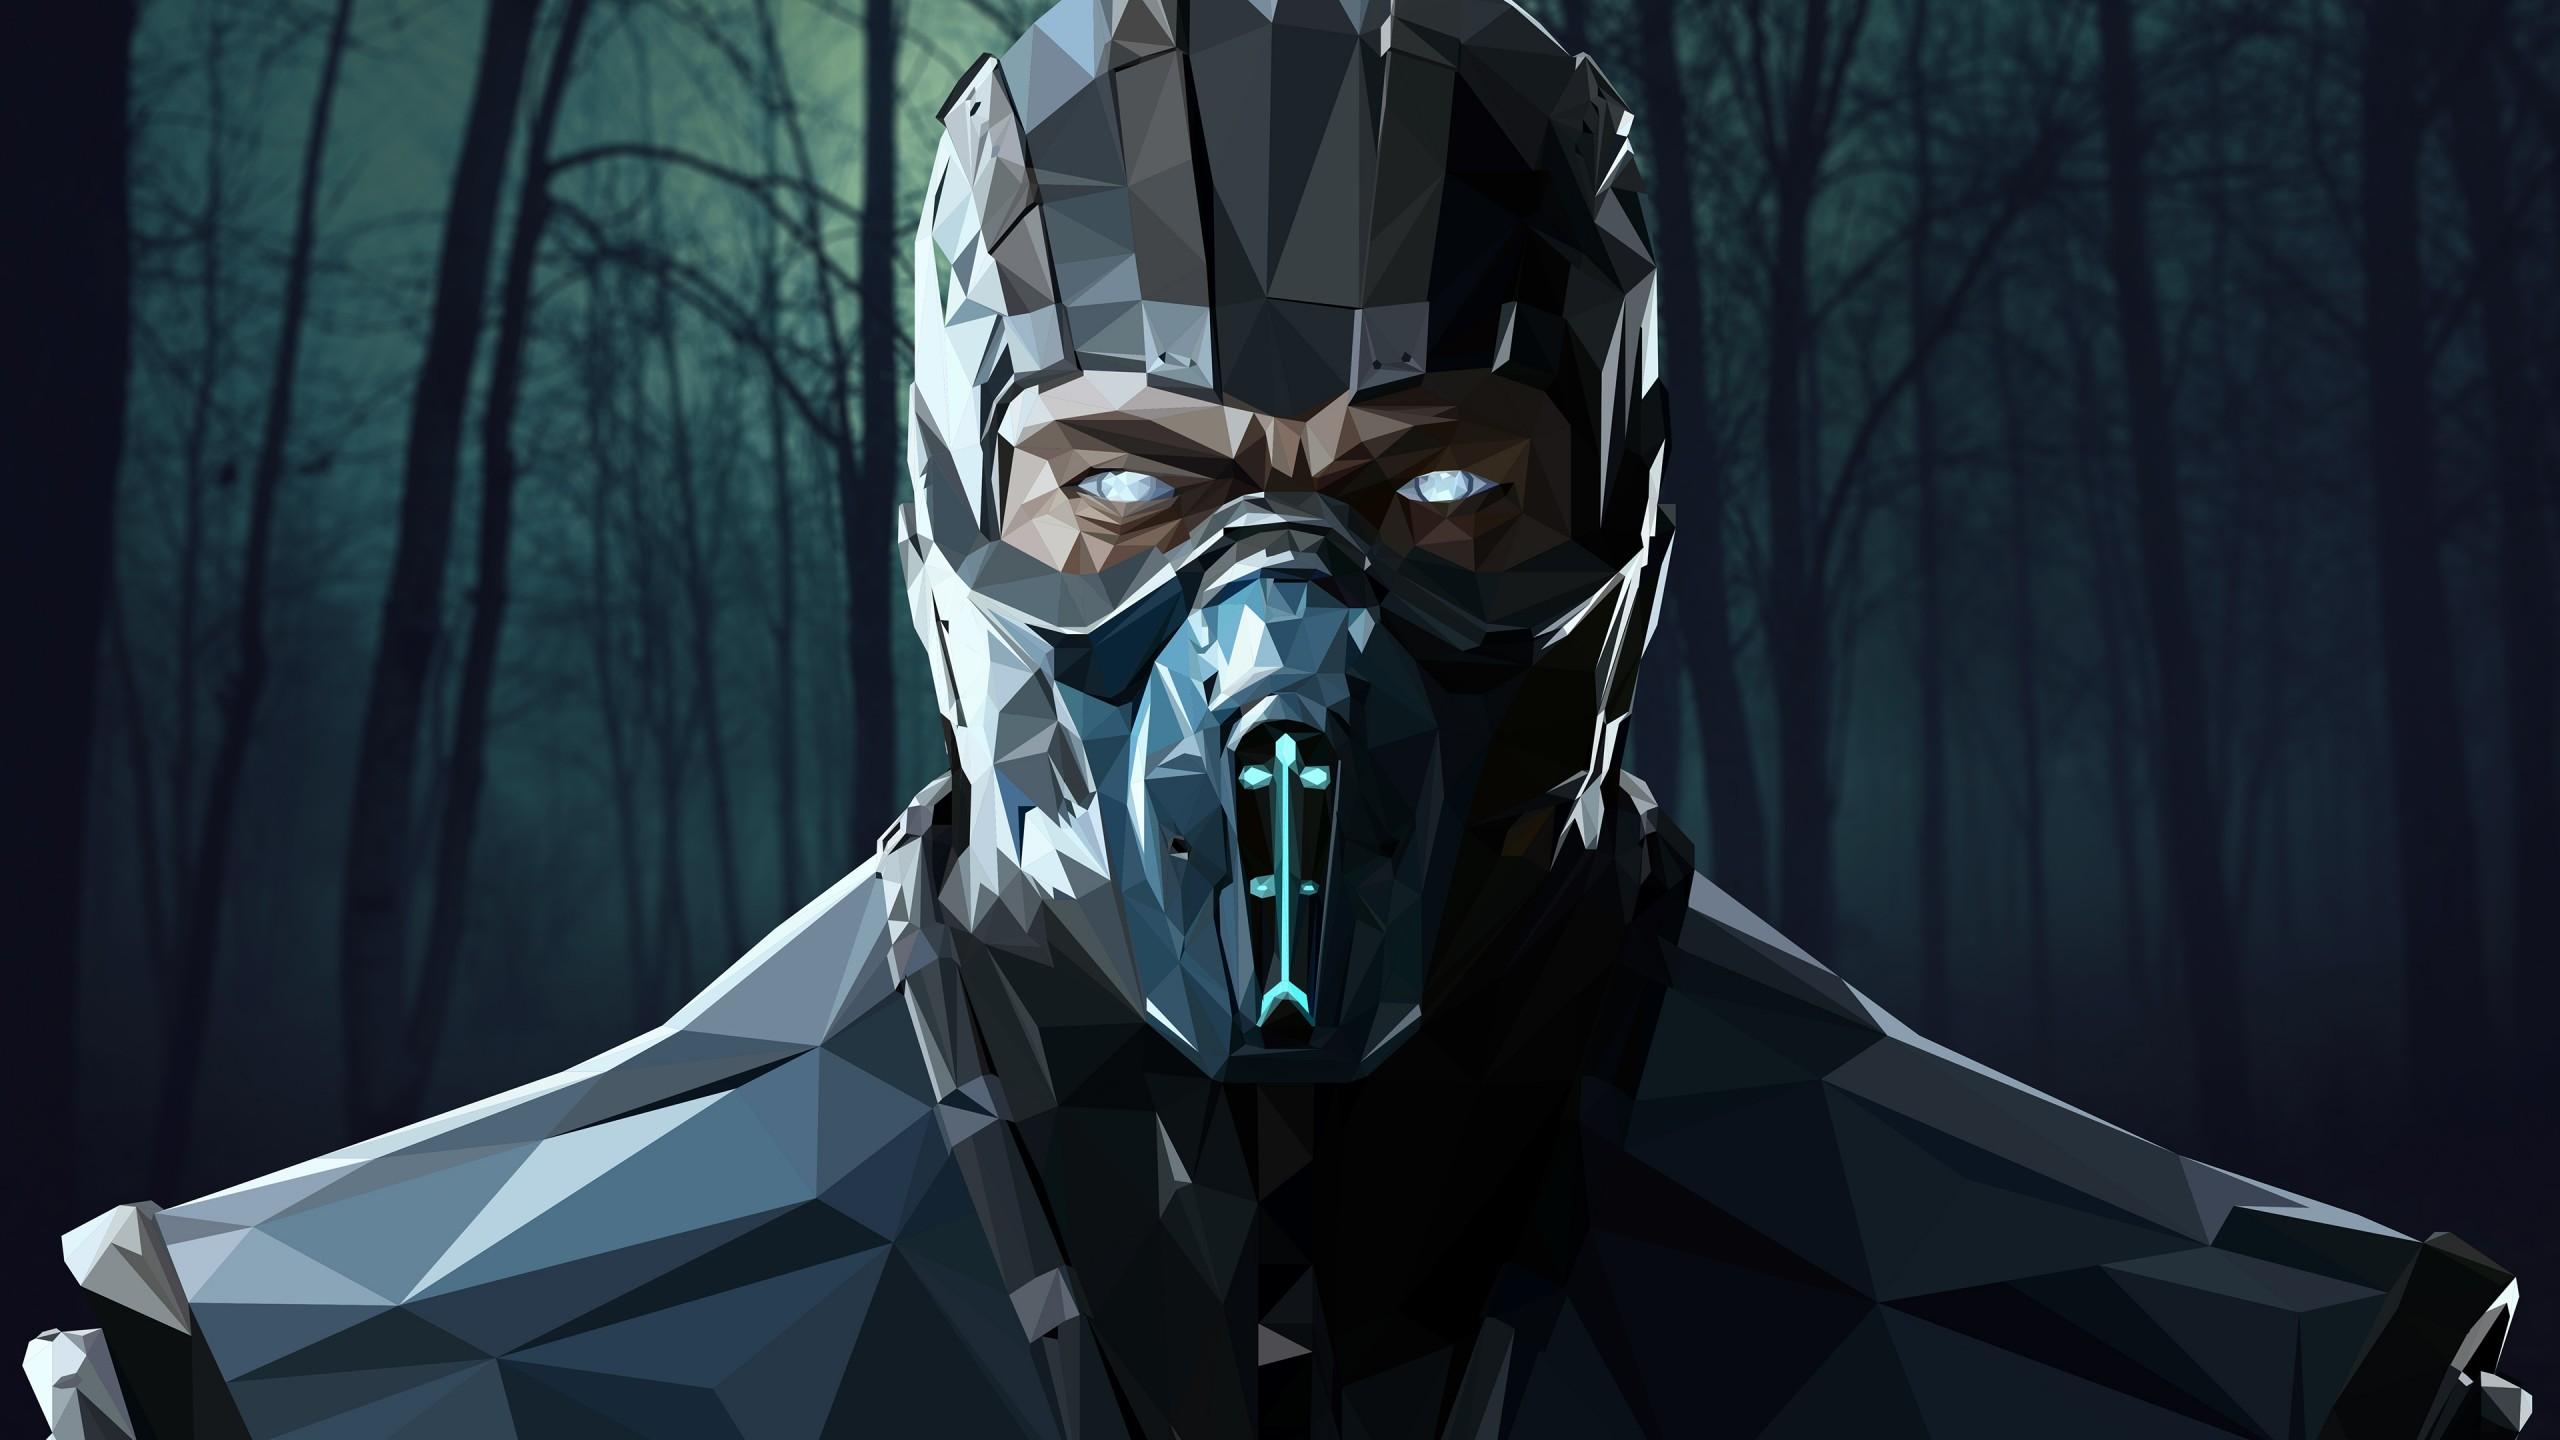 Wallpaper Mortal Kombat X Sub Zero Poster 4k Games 15066